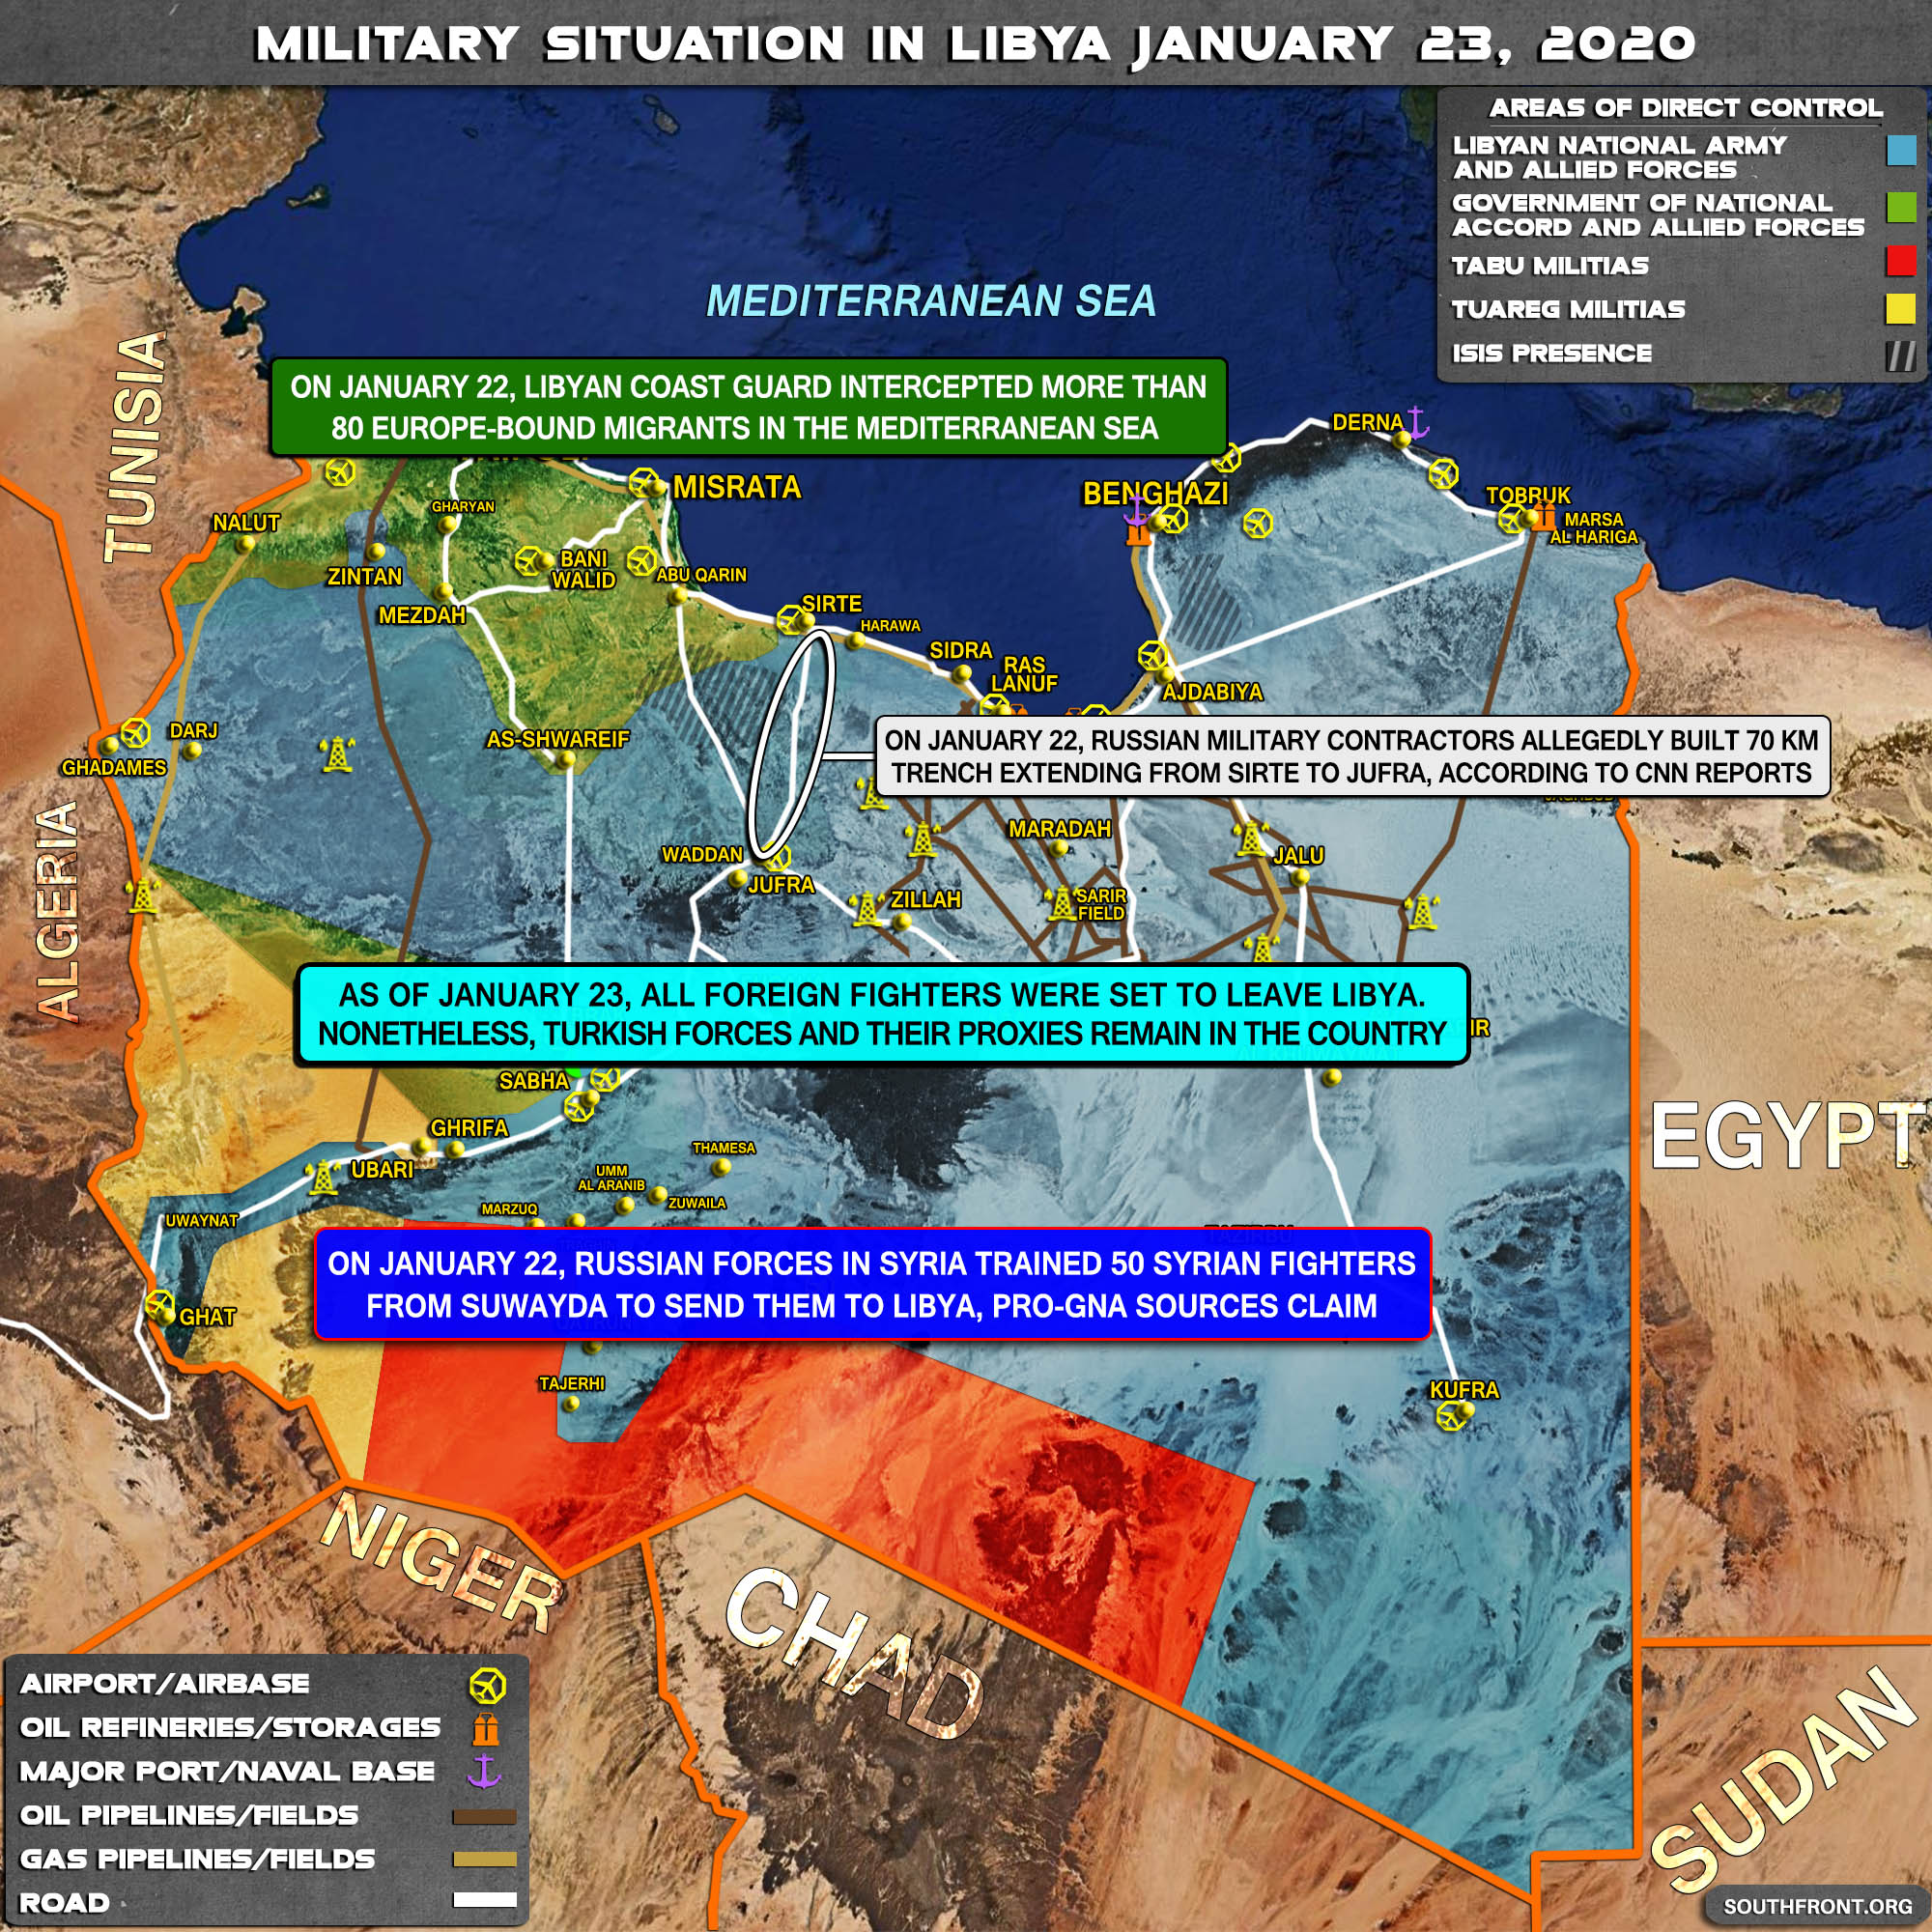 Turkey Is Still Deploying Syrian Mercenaries In Libya: Monitoring Group